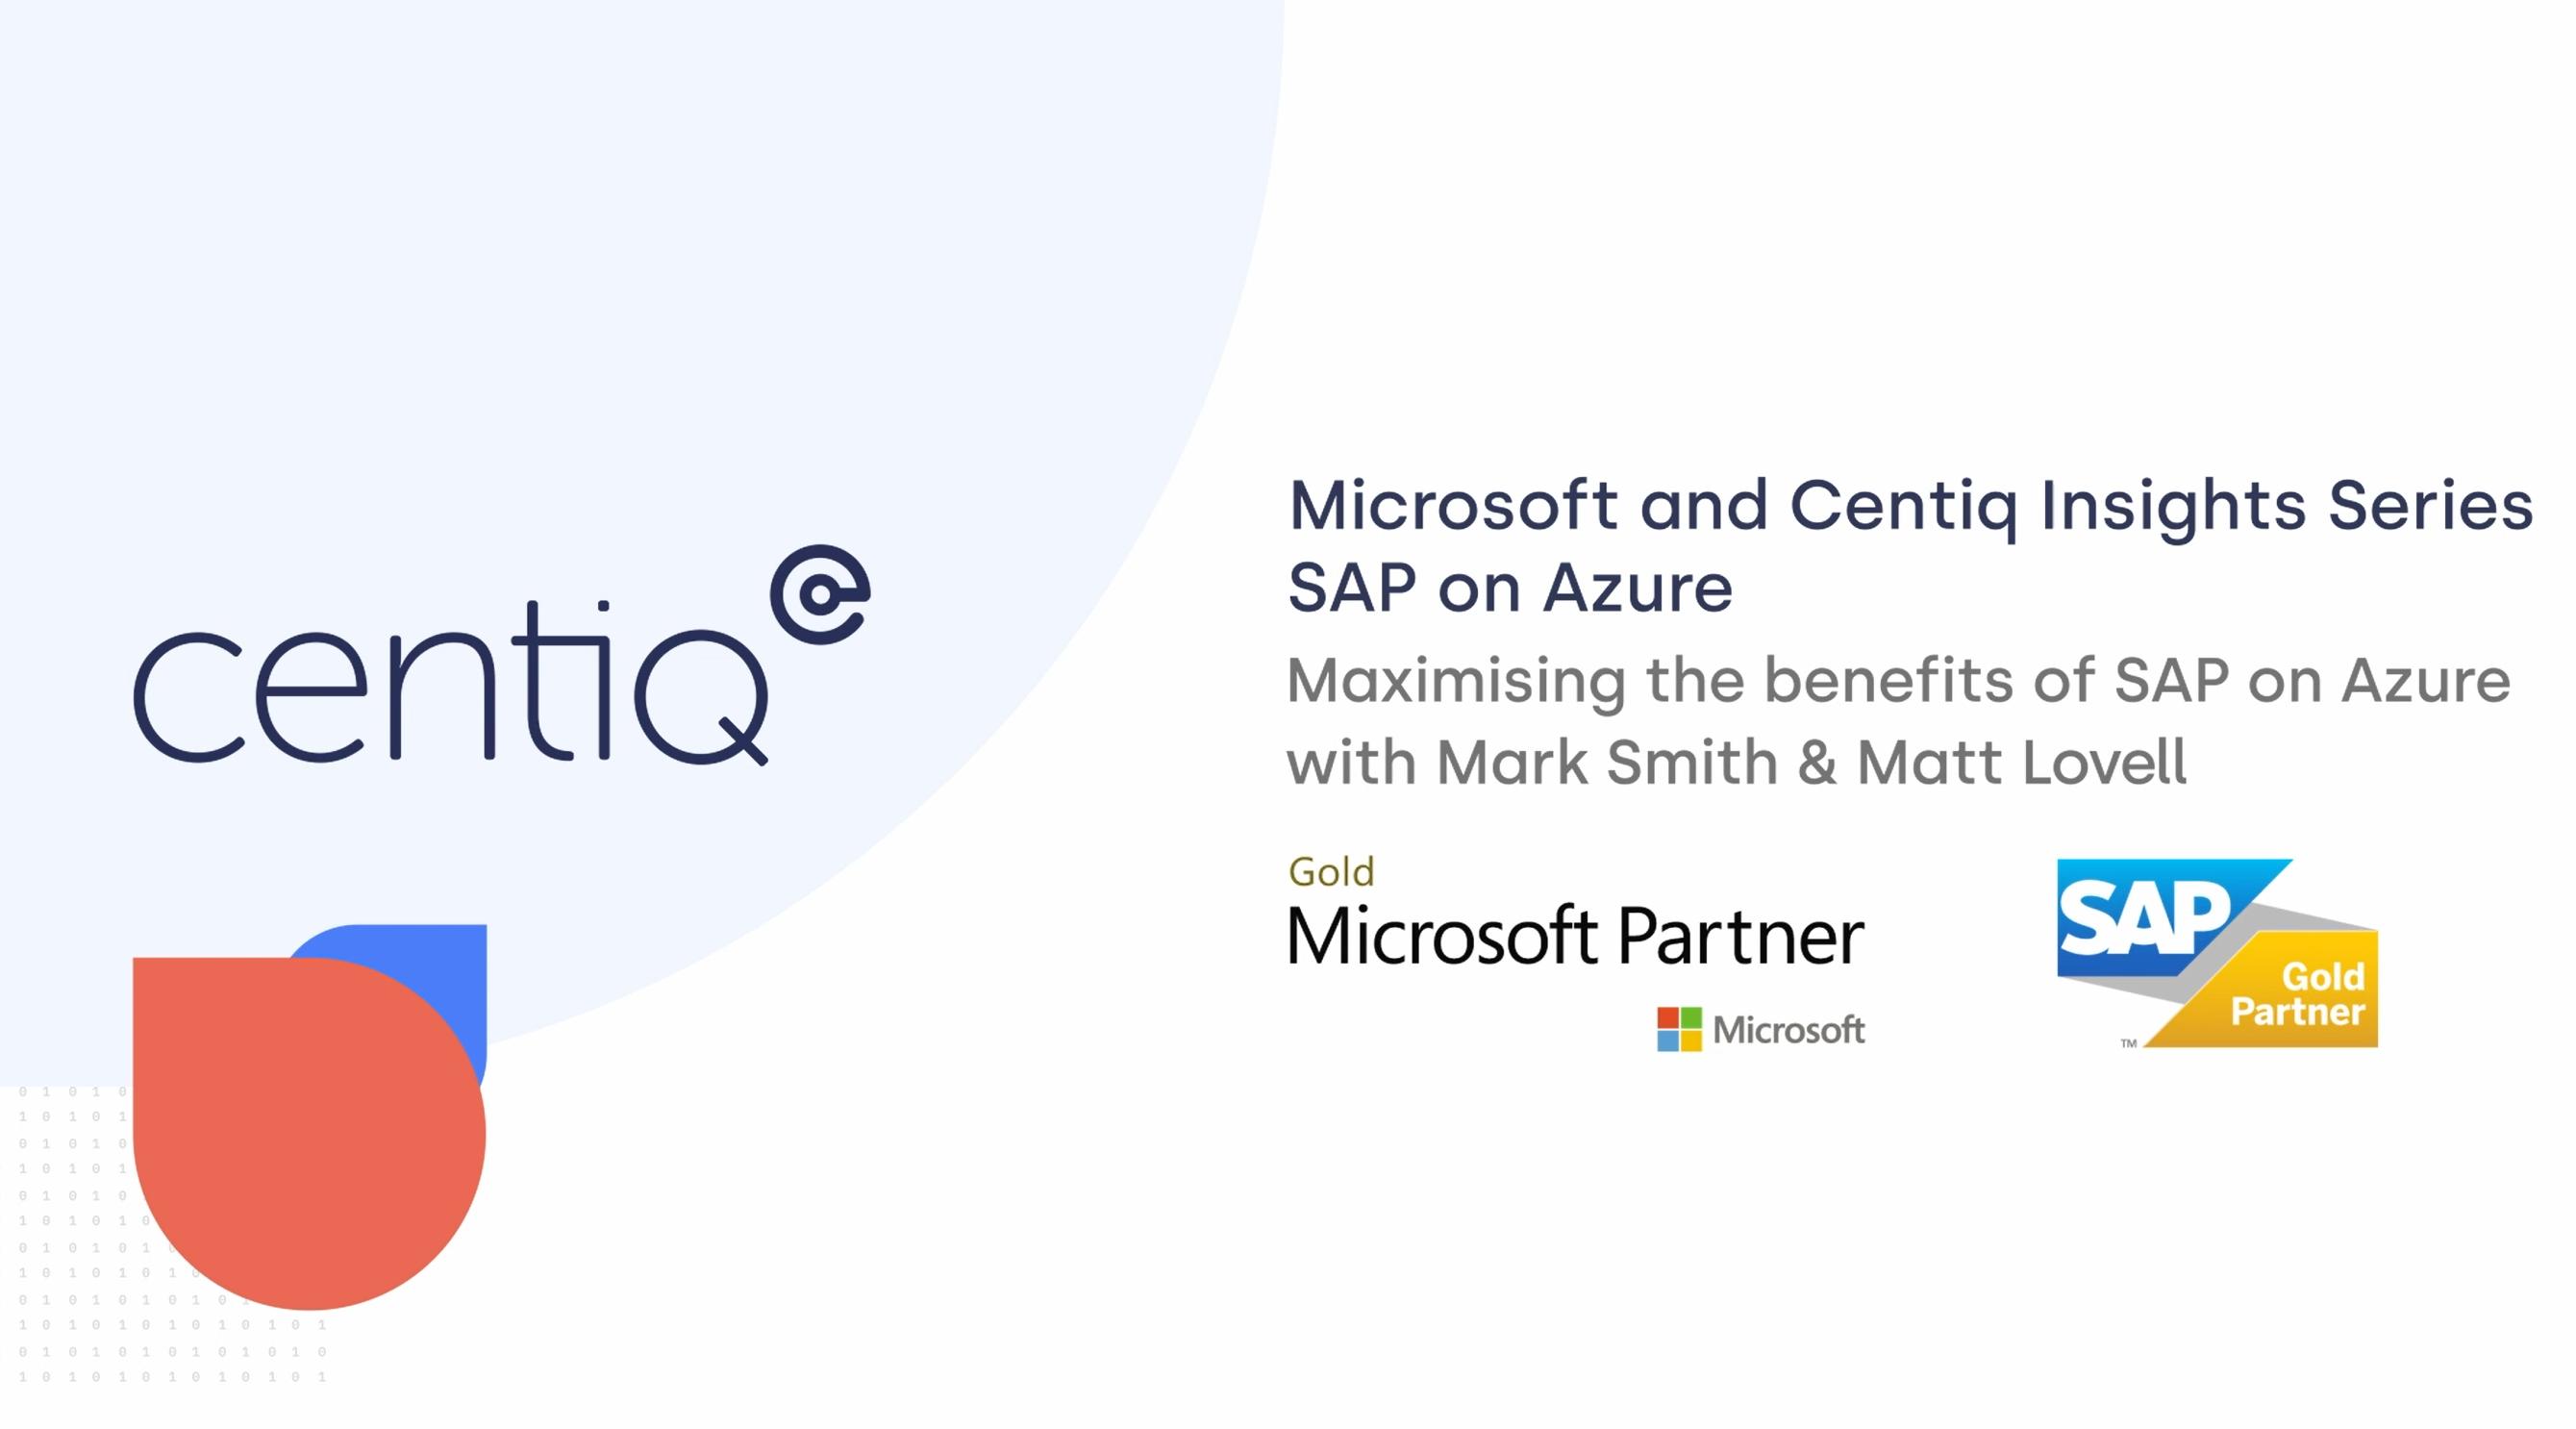 Microsoft & Centiq CXO Series: Episode 1